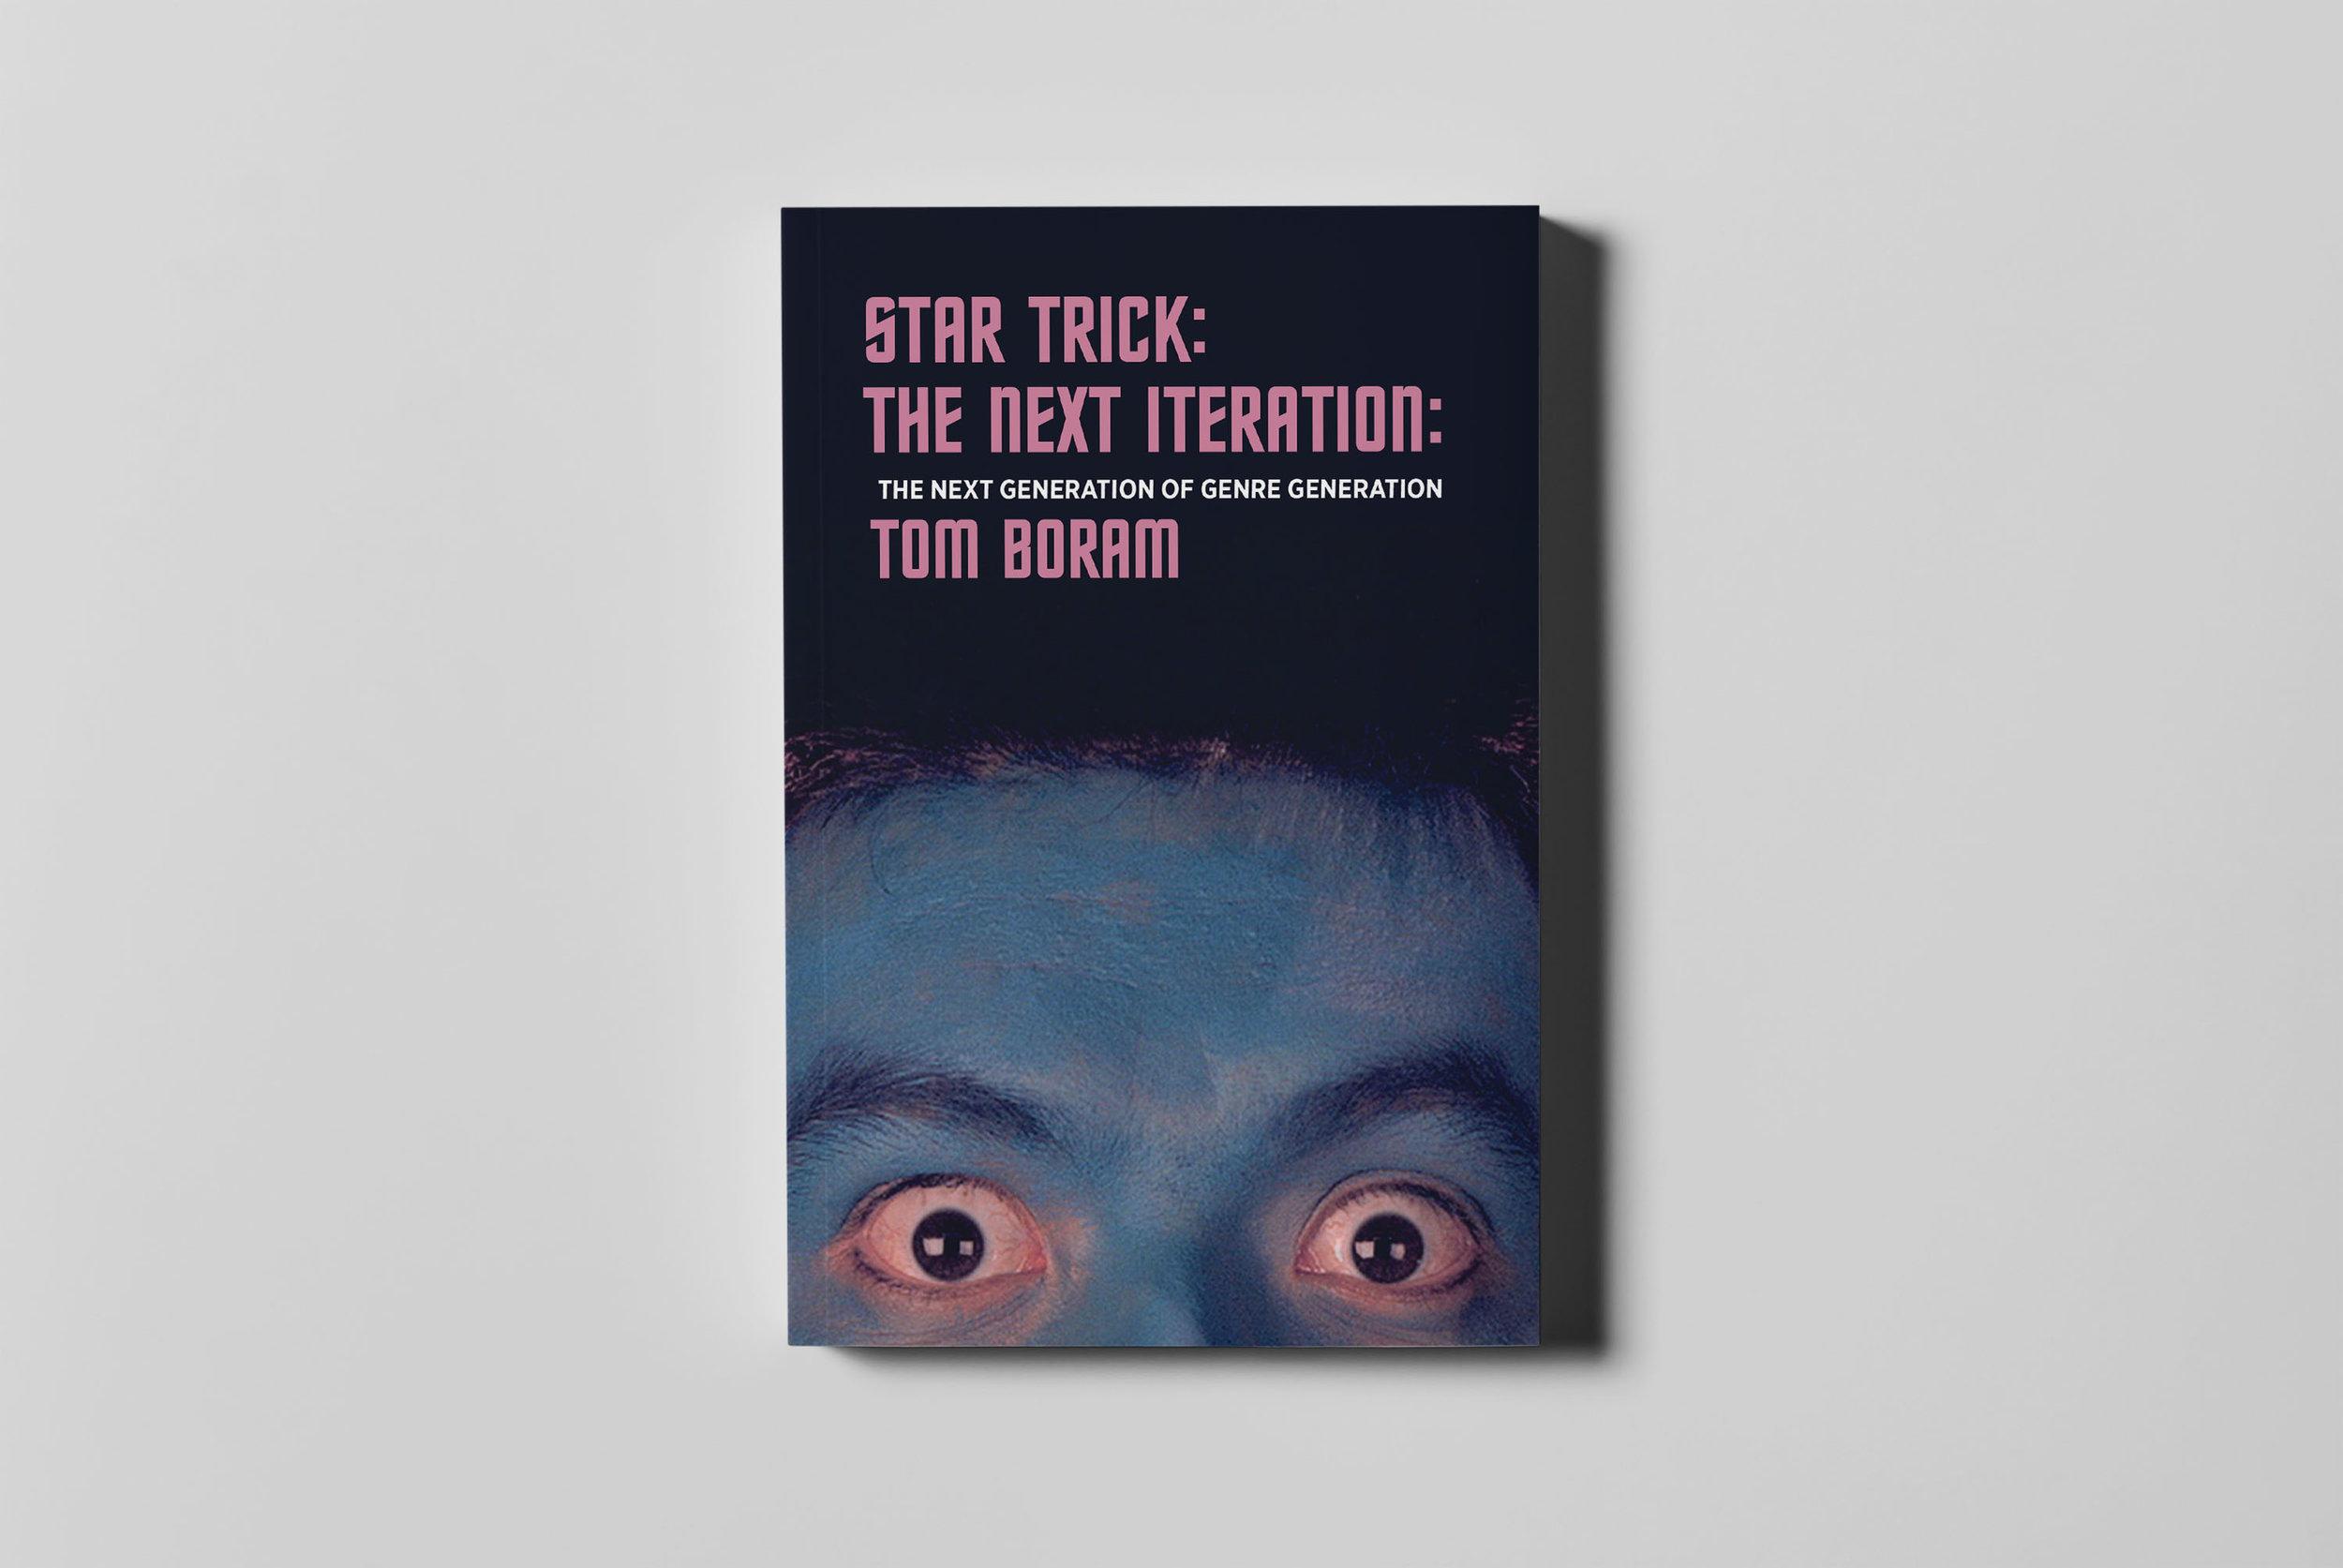 Star_Trick_cover.jpg